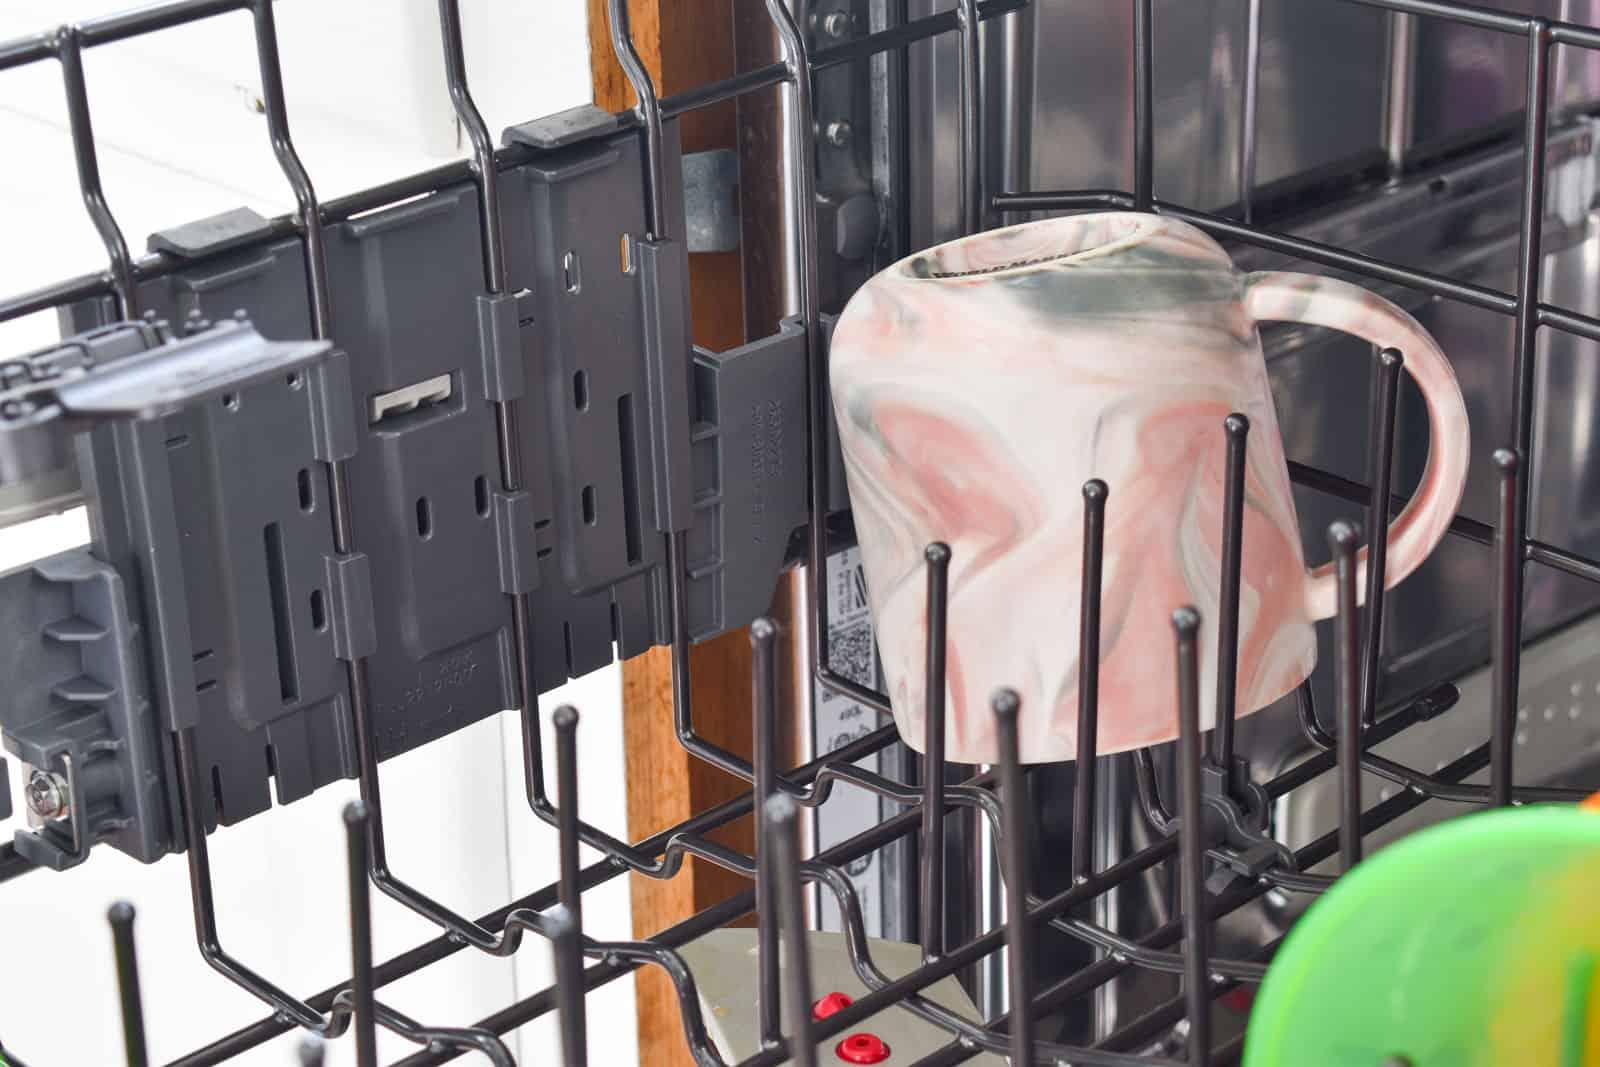 is your item dishwasher safe?